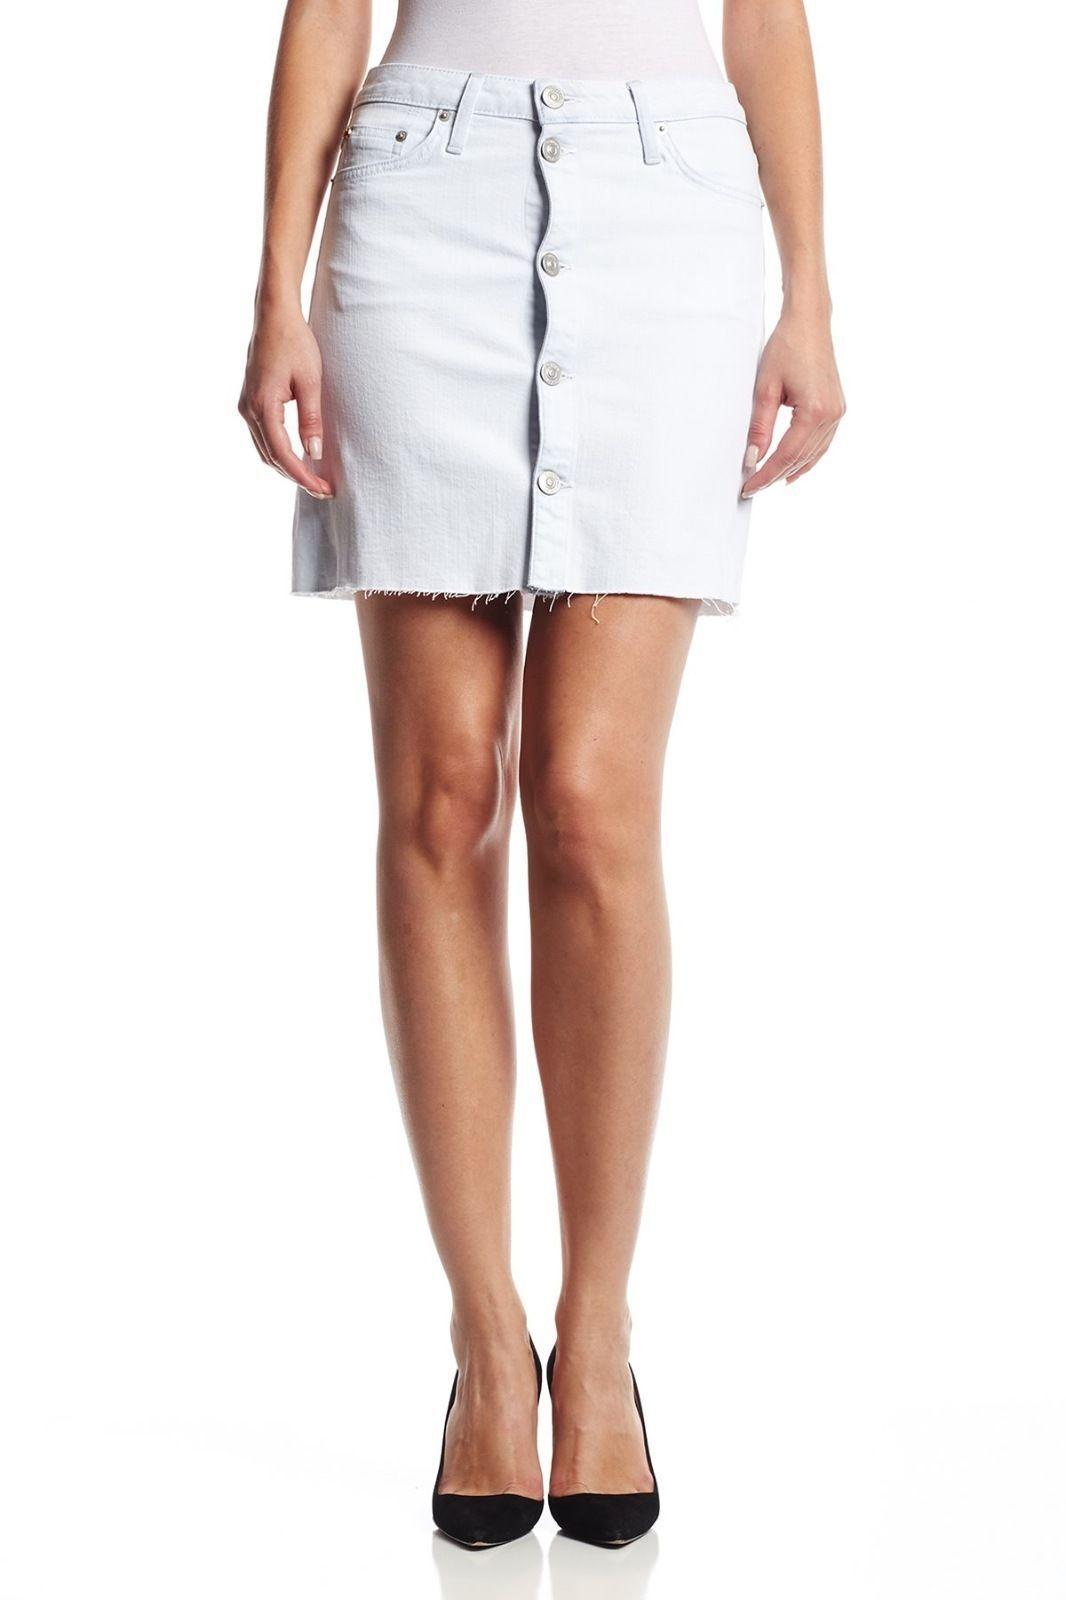 NWT Hudson Jeans Light bluee Denim Cammy Button Front Pencil Mini Skirt 30